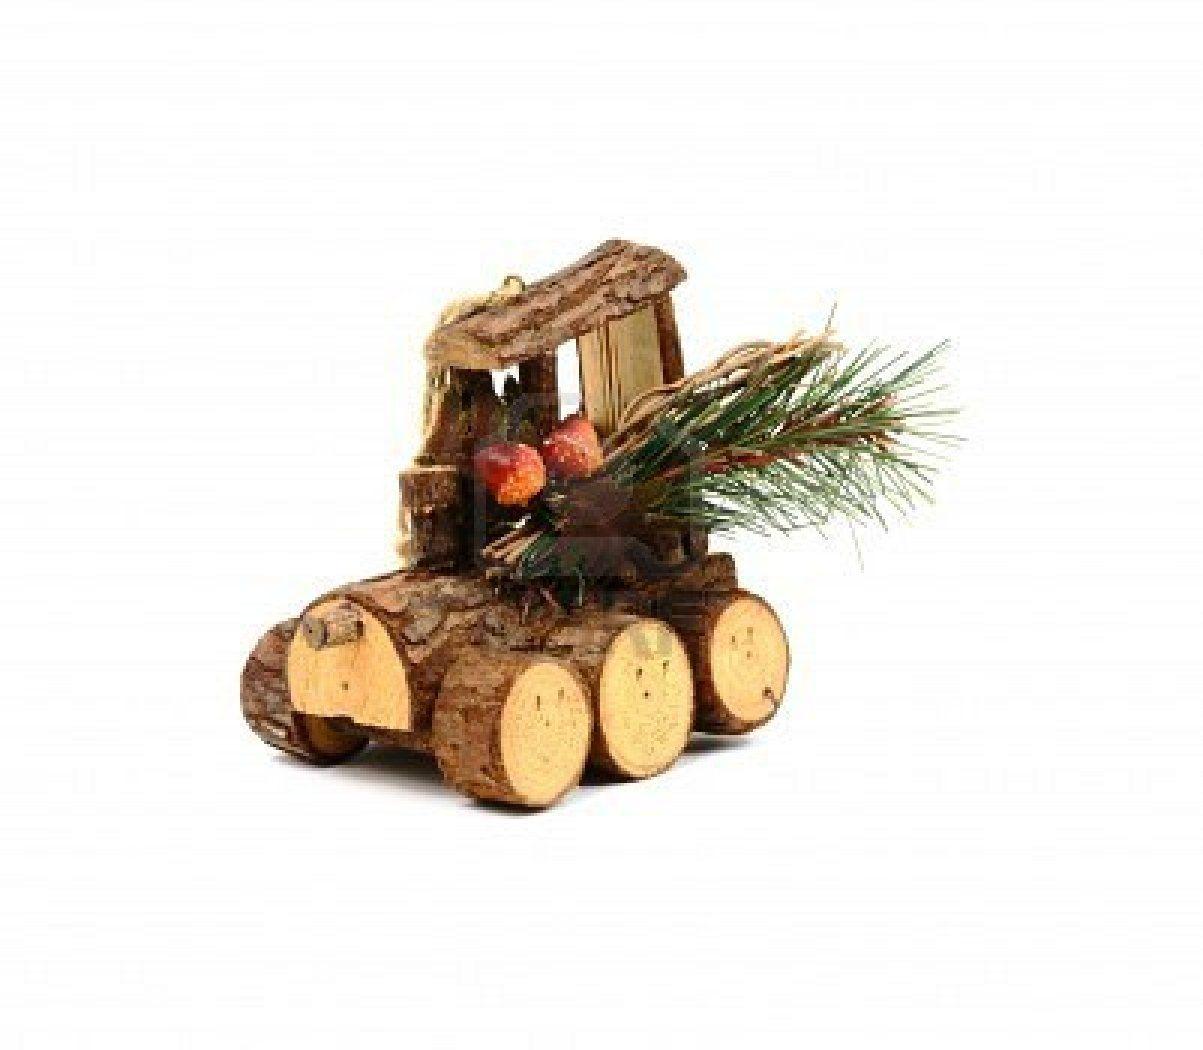 Rustic Christmas Tree ornament